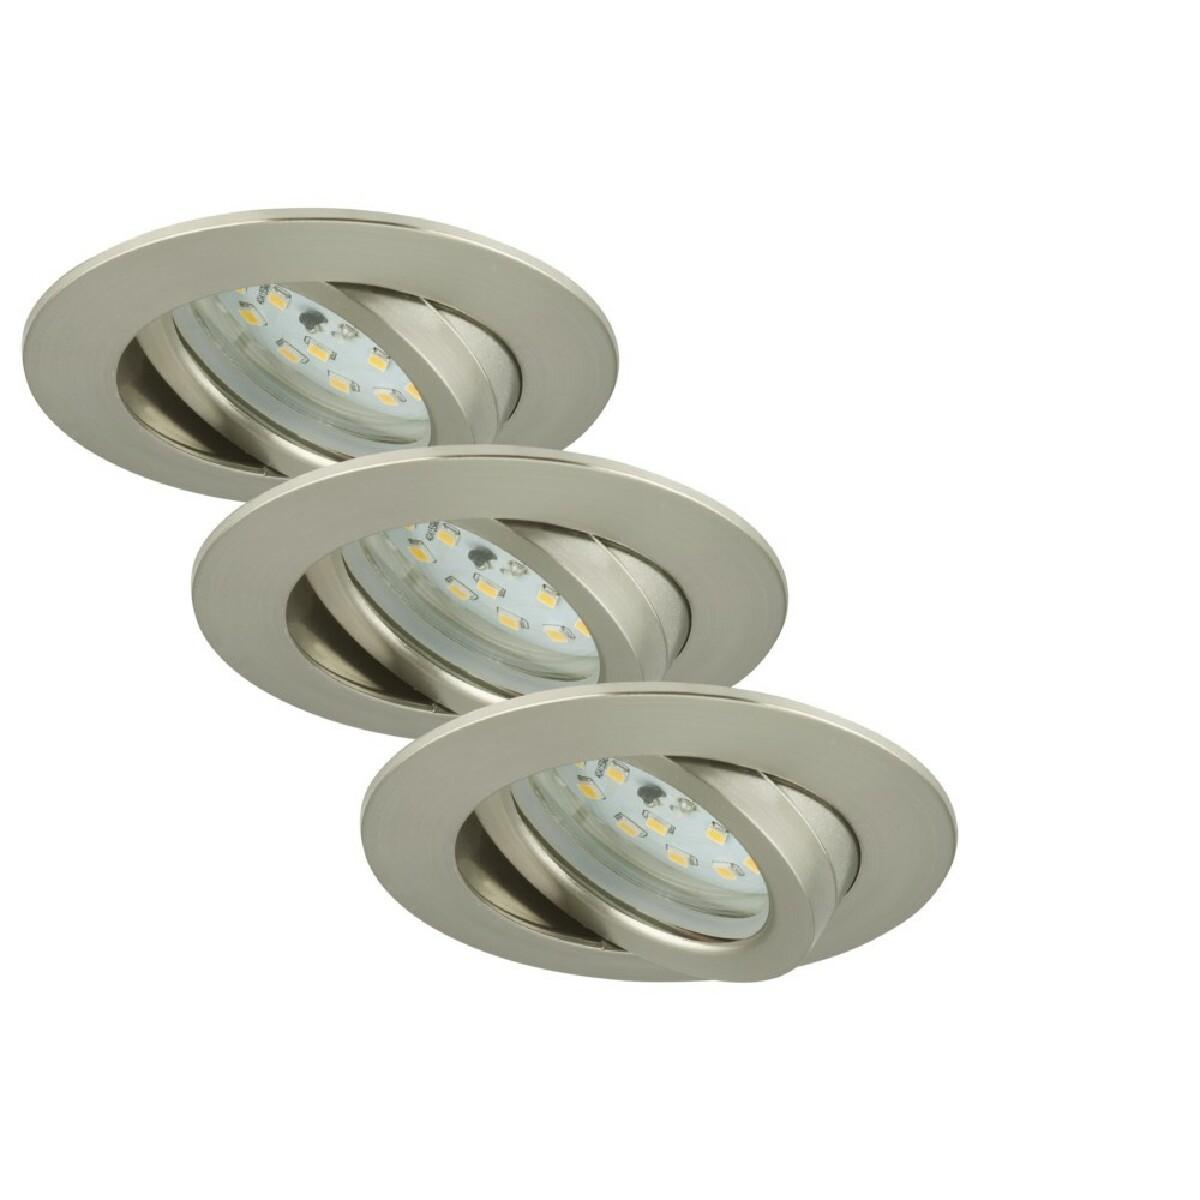 Briloner Leuchten Set 3 Spot Encastrables LED Orientable BRILONER Module 5,5W 470lm dimmable Ip23 Nickel Mat